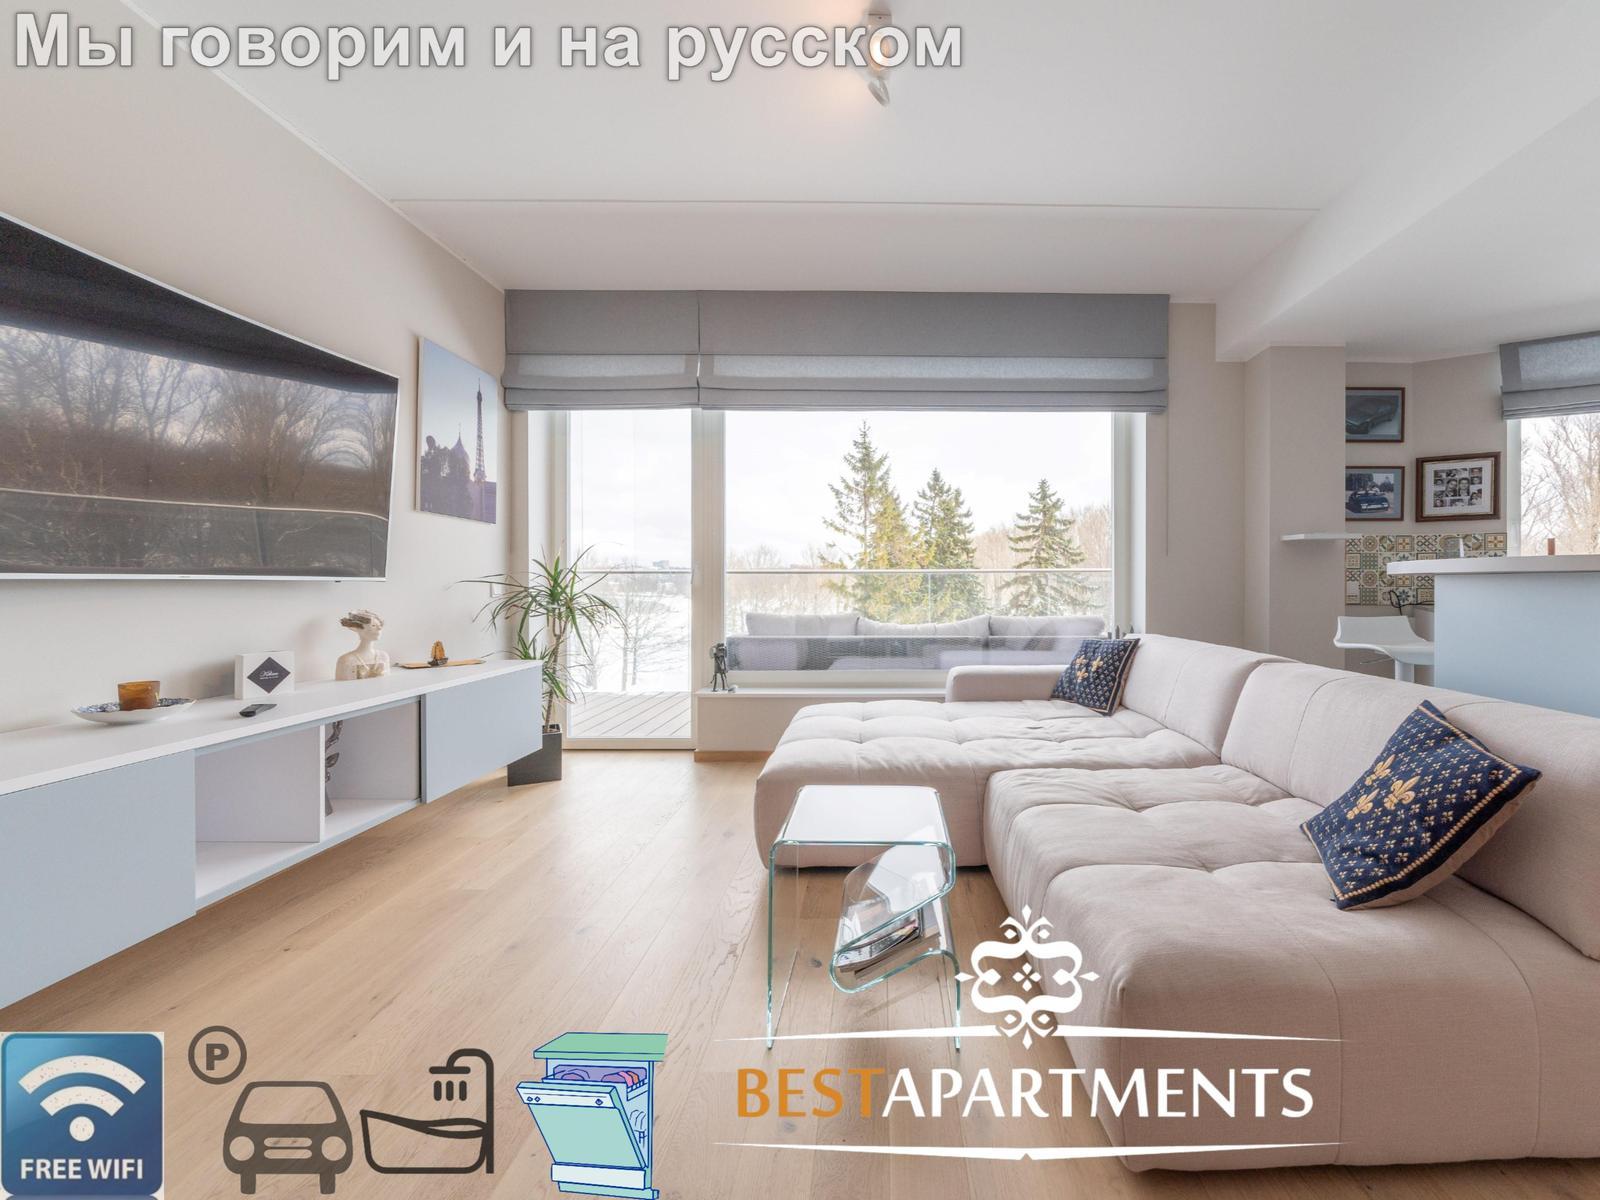 Tallinn Apartments - Book your apartment online Now - Best Apartments